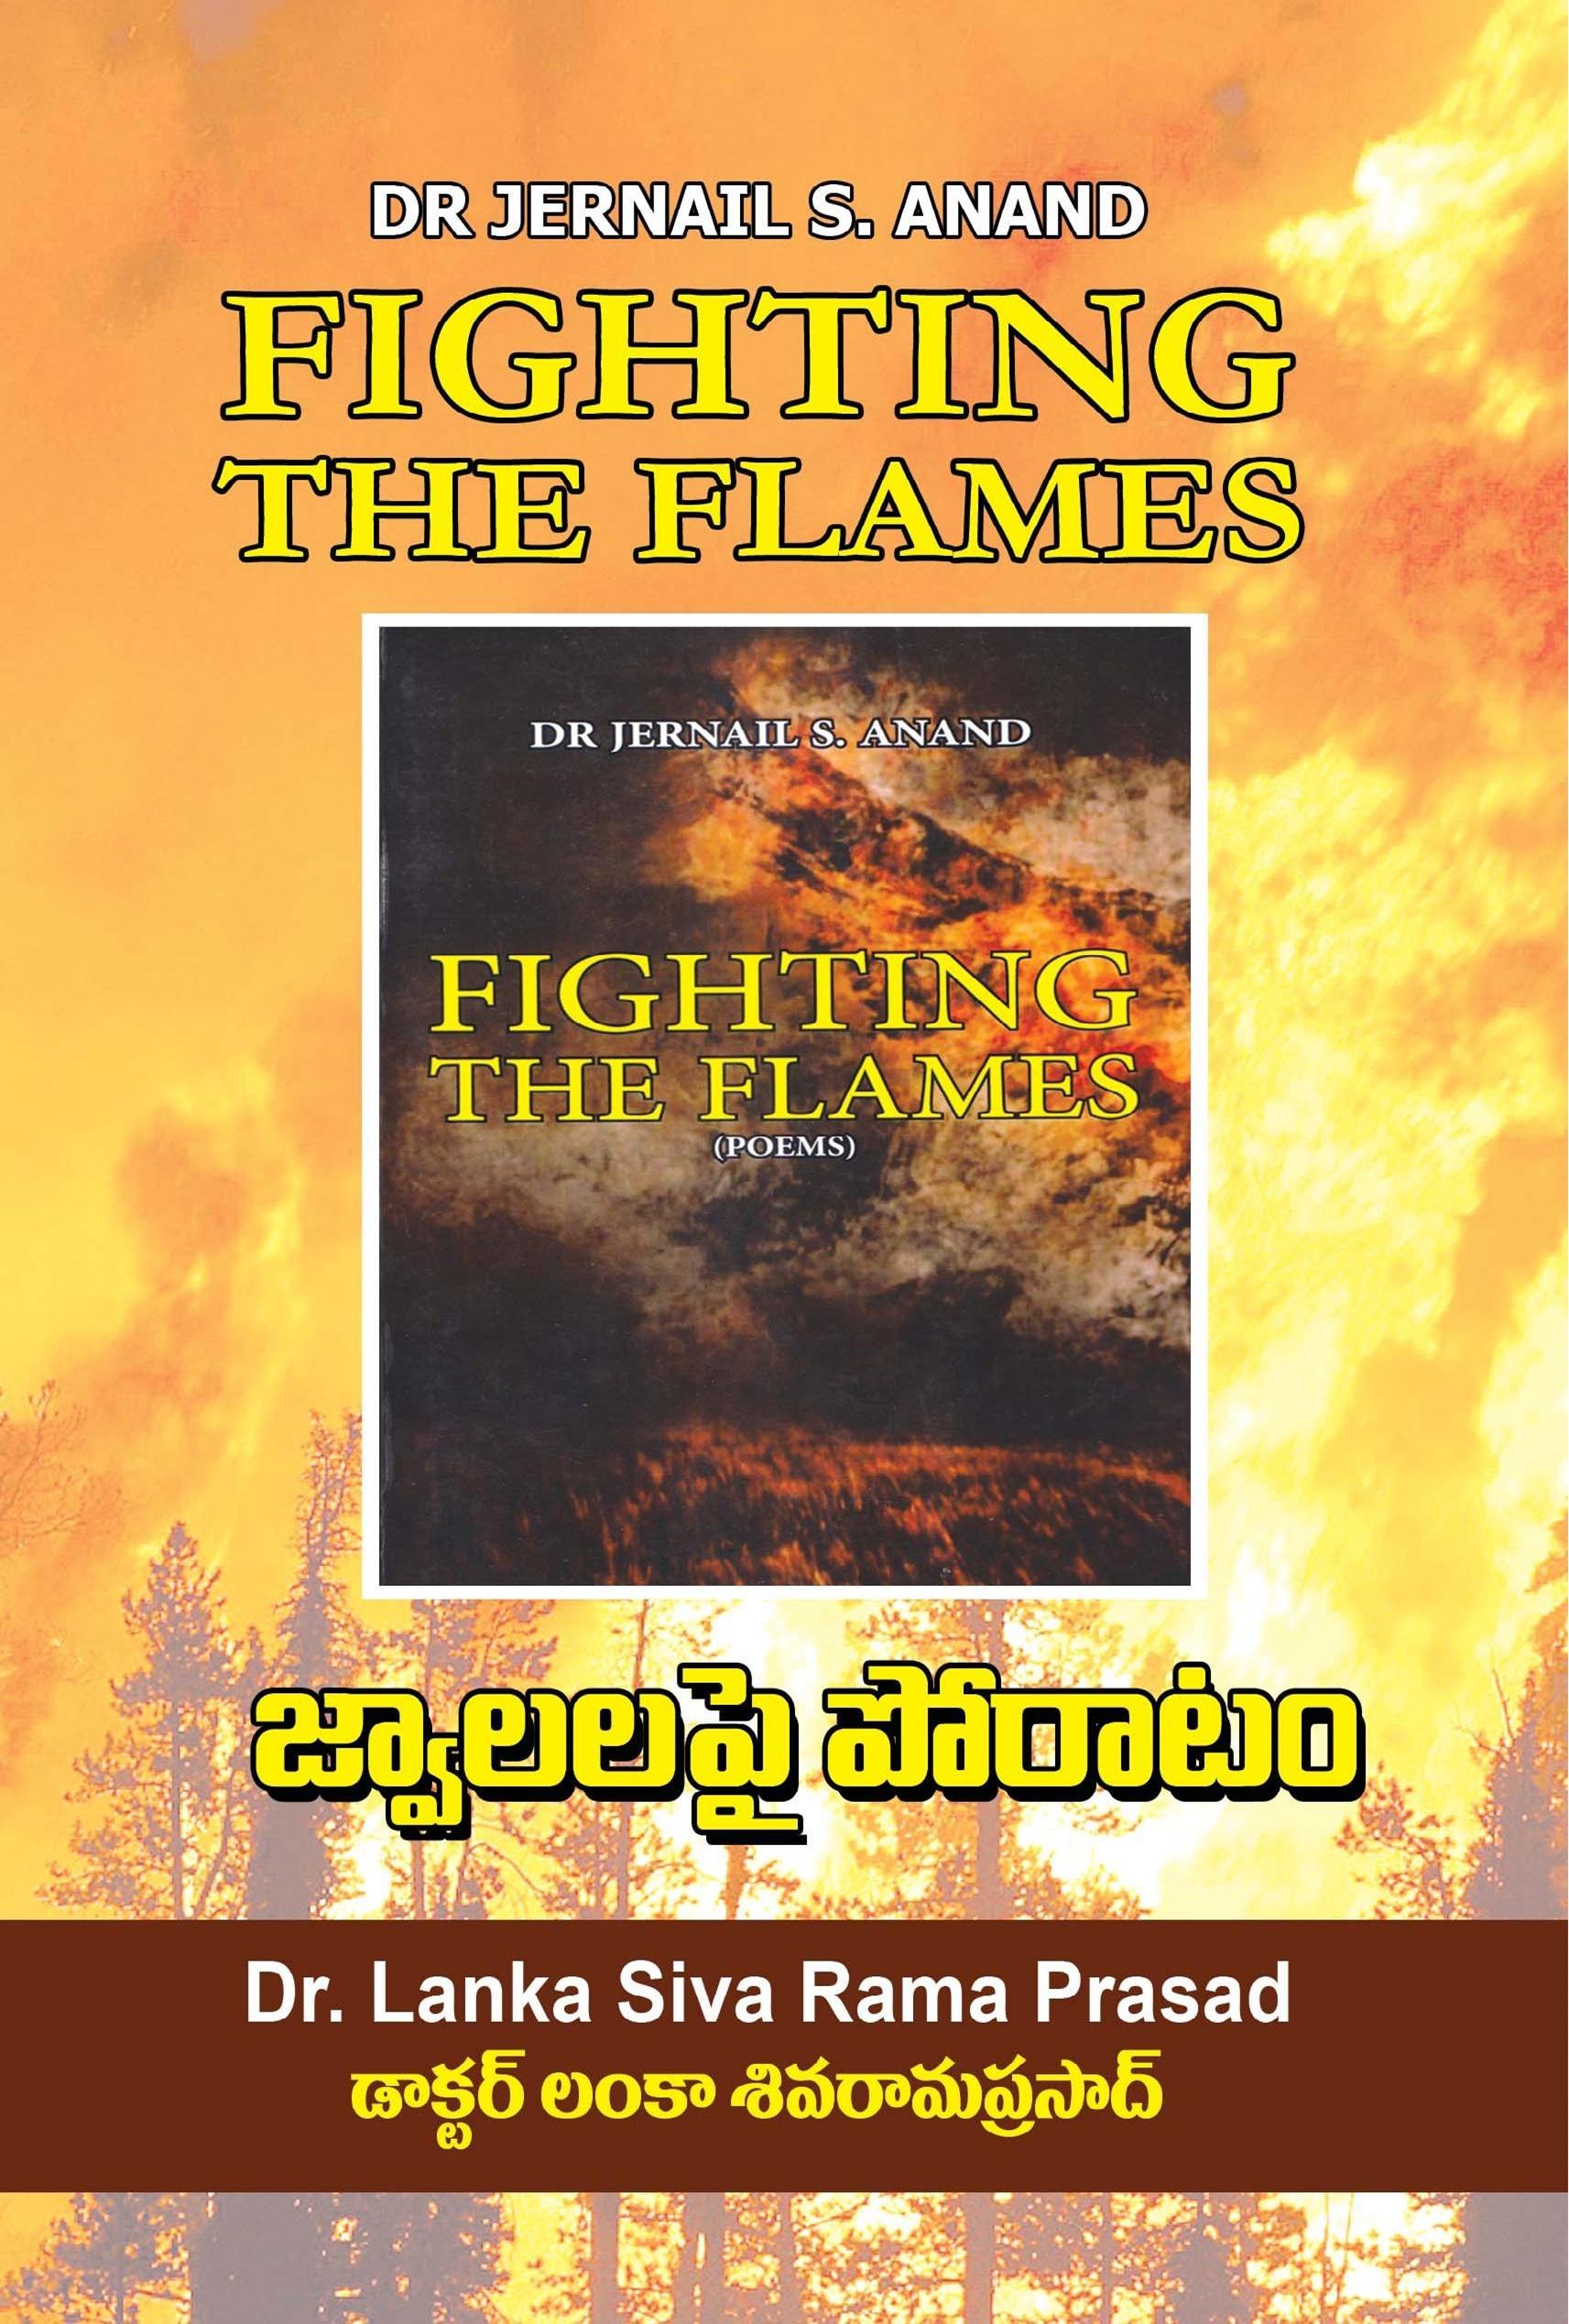 Jwaalalapai Poaraatam (Fighting the Flam